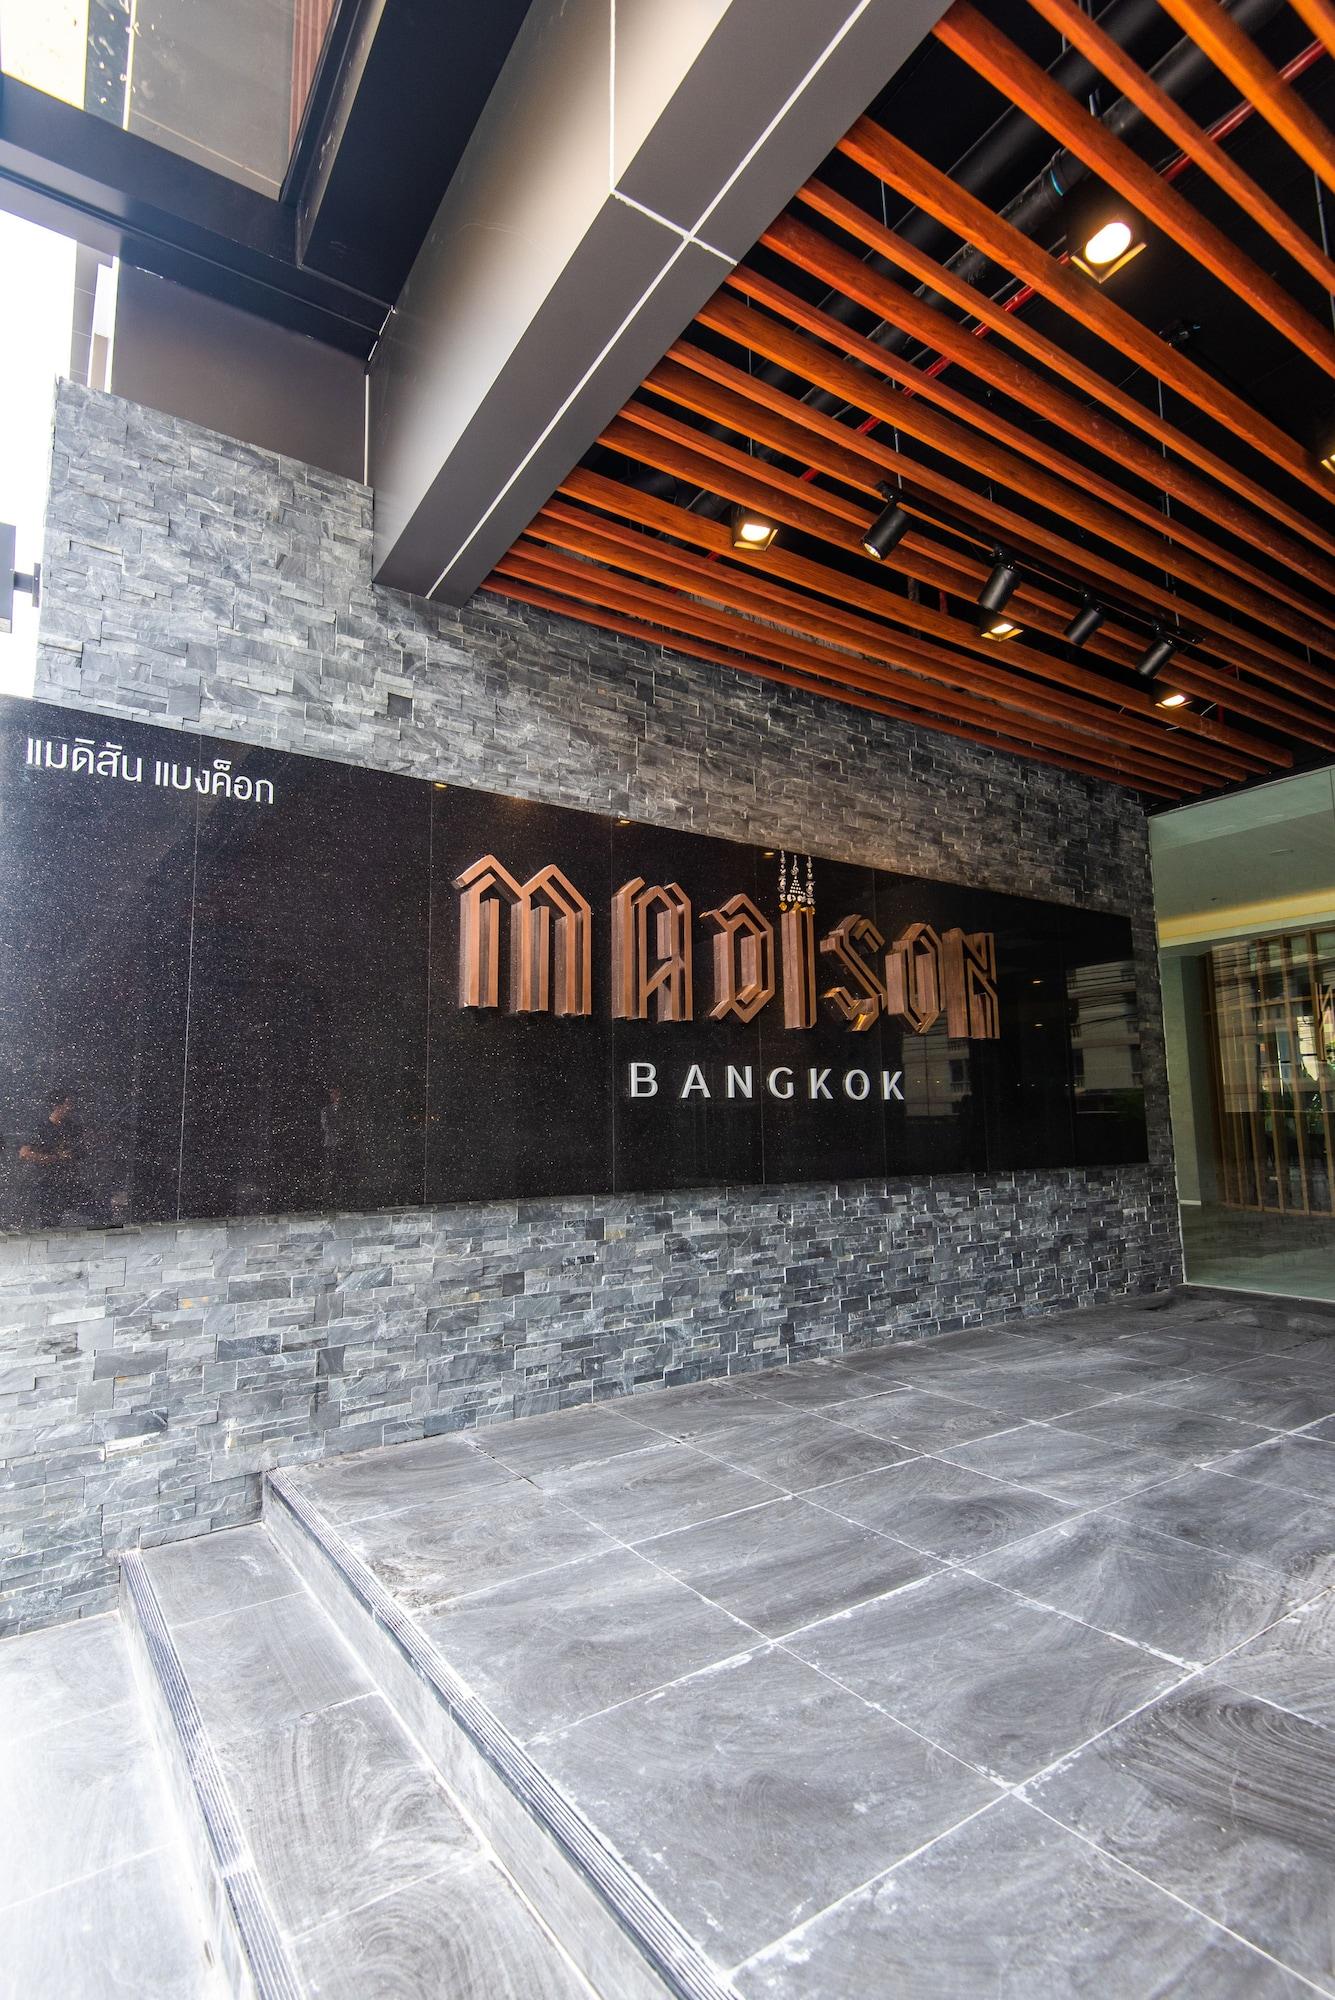 Madison Bangkok, Bang Kapi